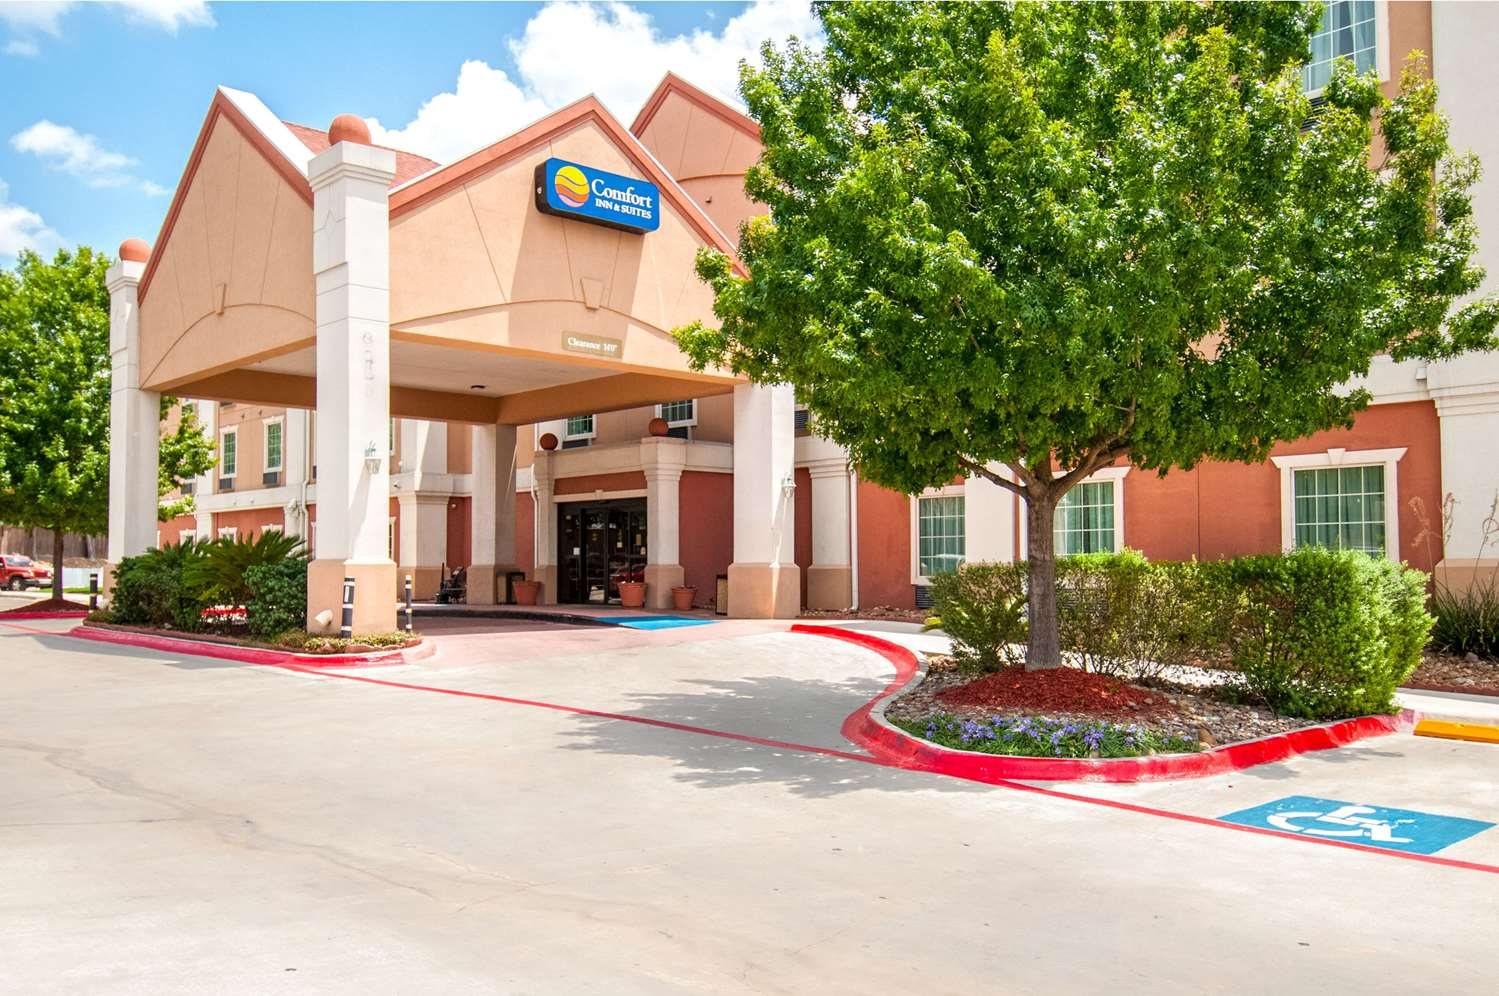 Comfort Suites At Vance San Antonio Tx See Discounts